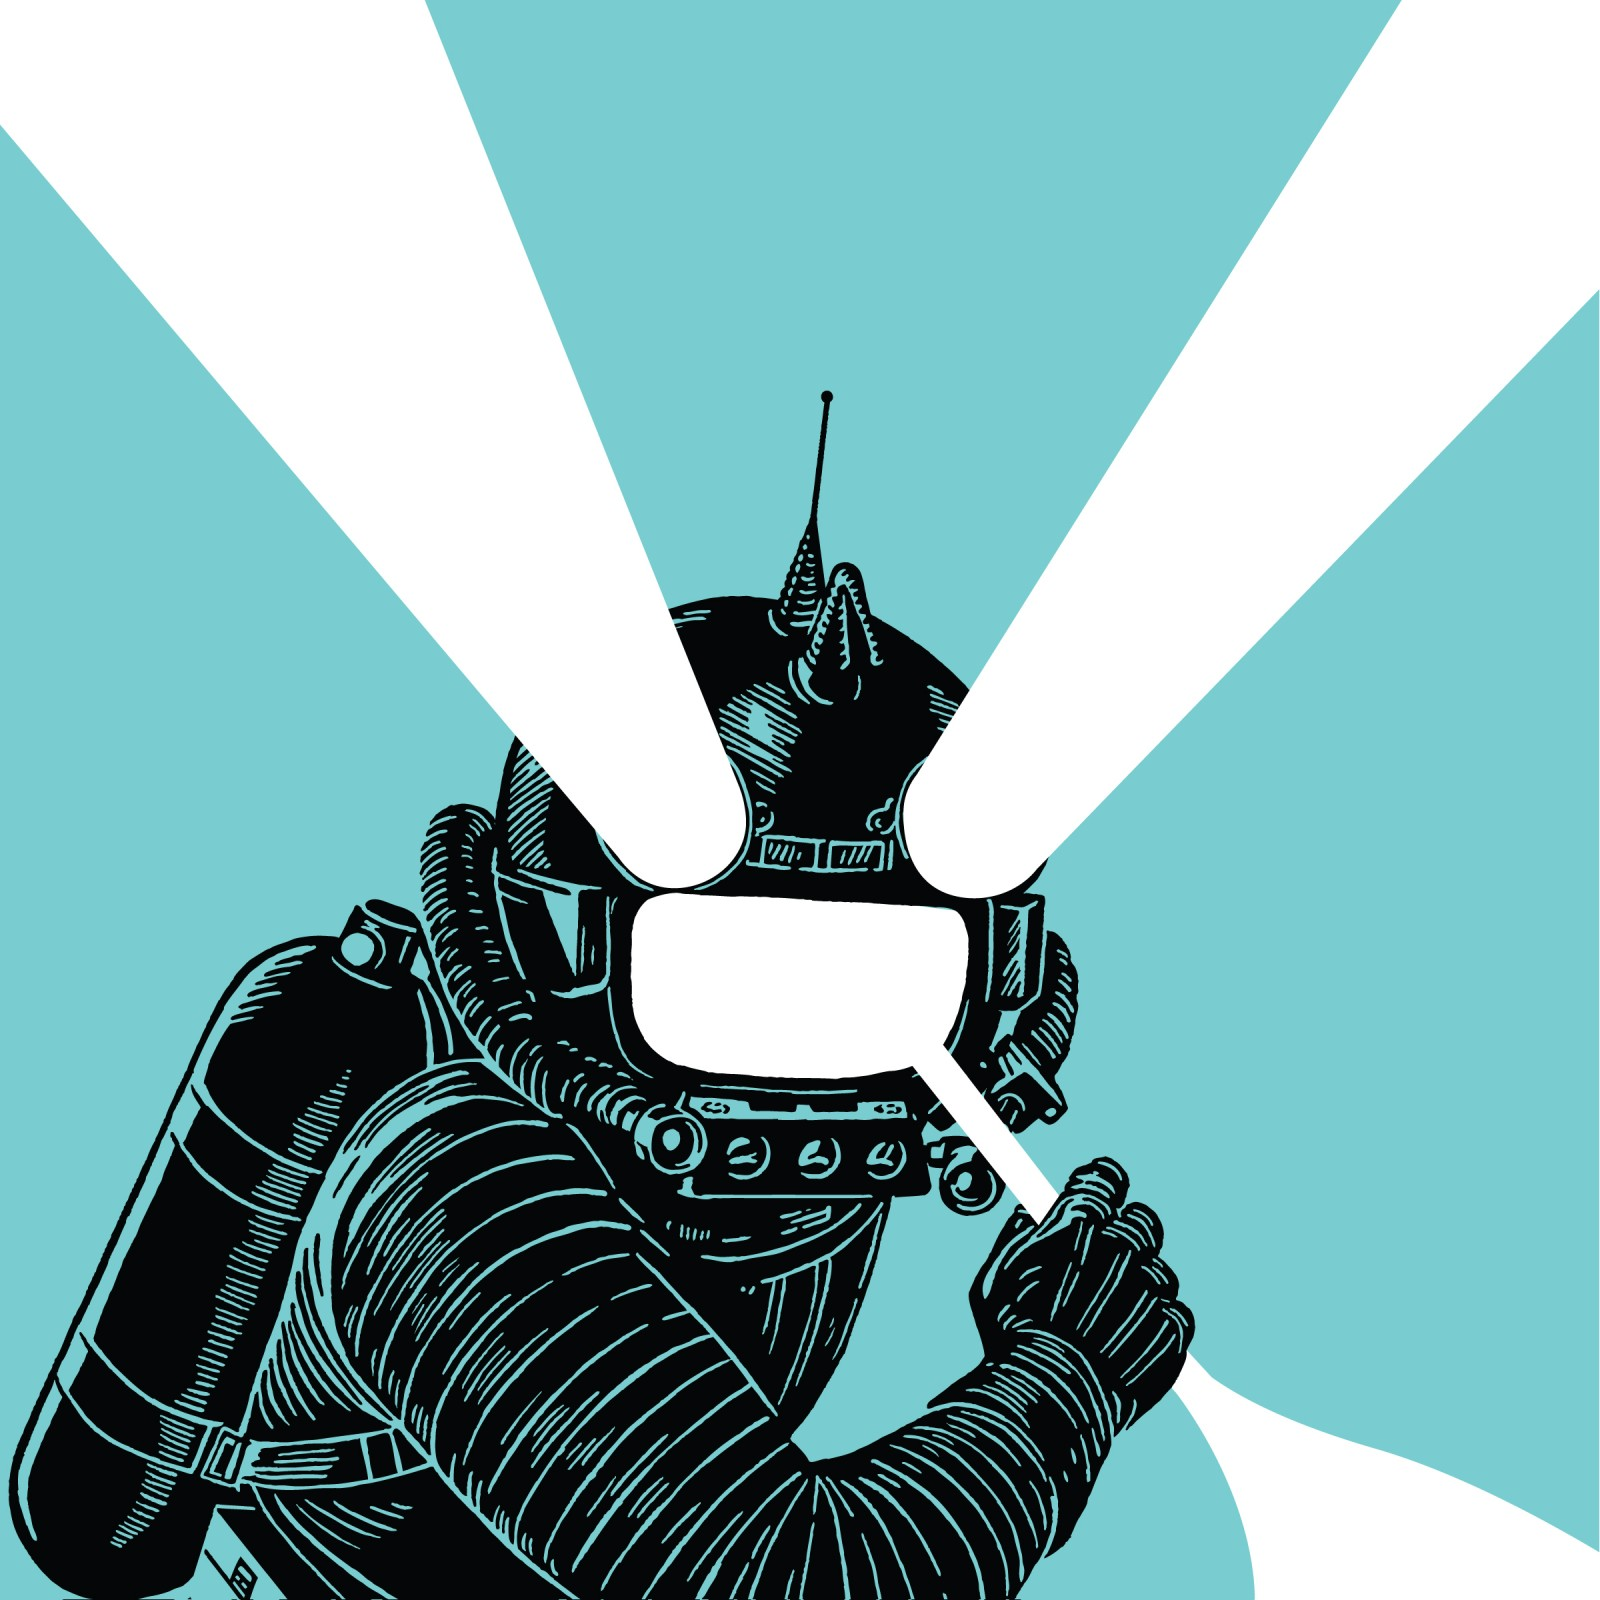 acrobotic-ep1-2400